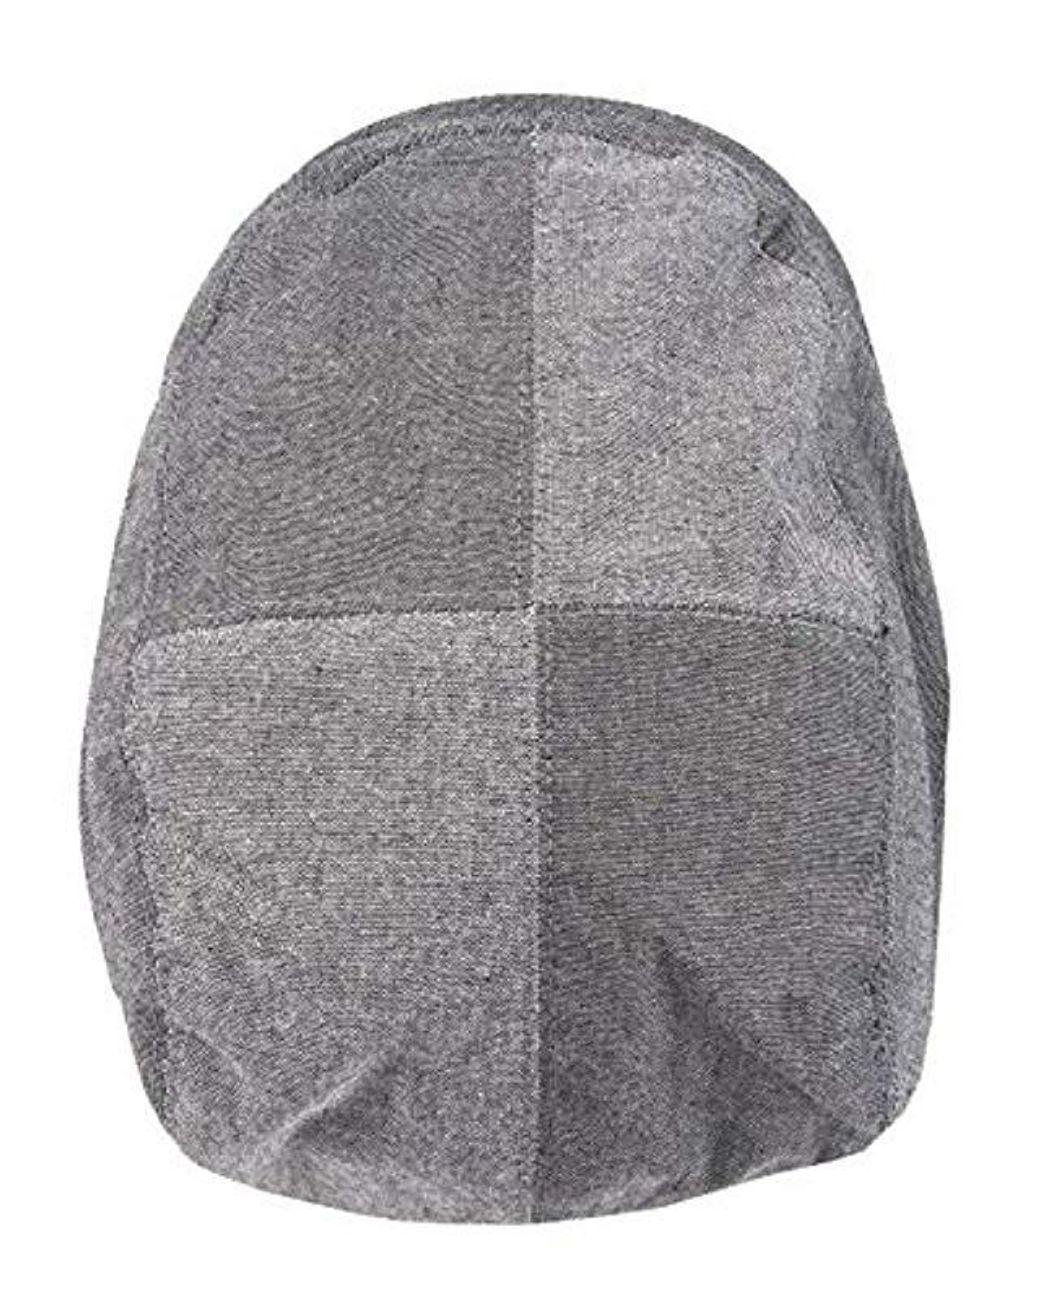 Papa Jjwokaaya Custom Particular Unisex-Adult Best Ever Baseball Cap Hats Navy